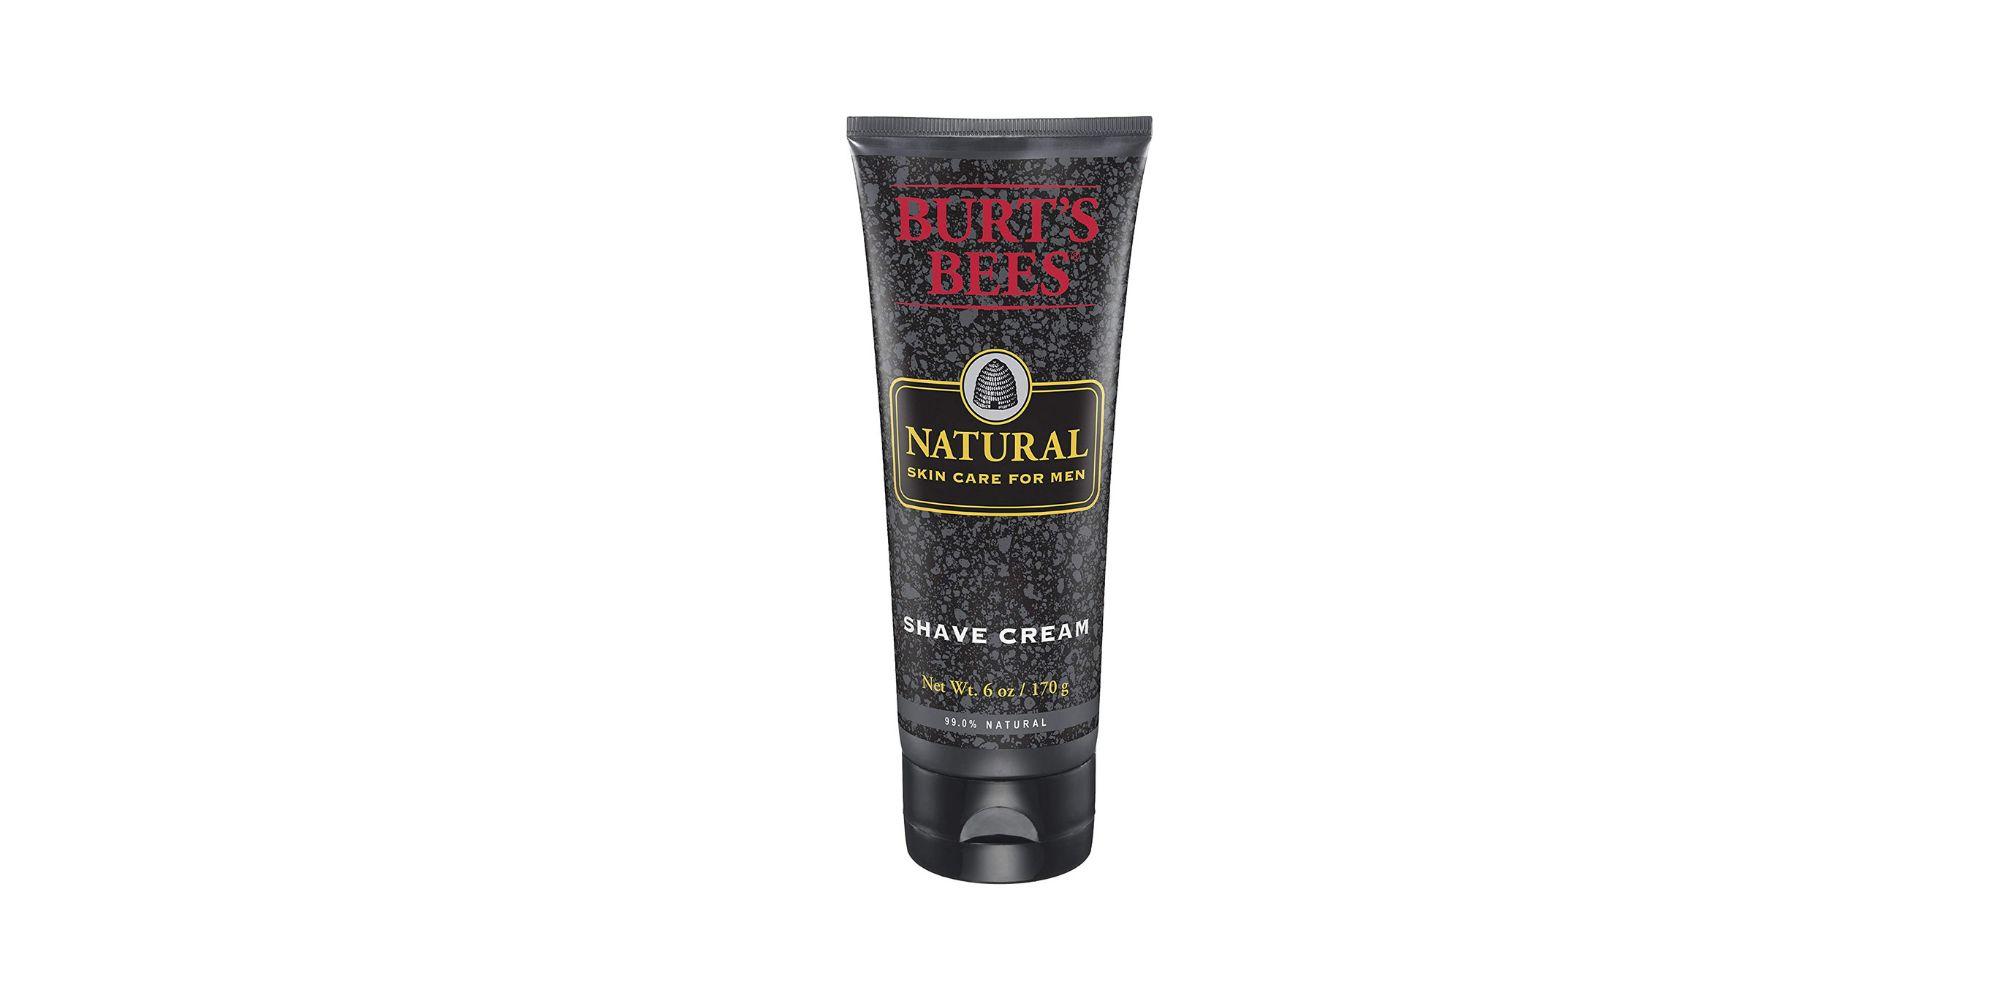 Burt's Bees Natural Skin Care for Men Shave Cream